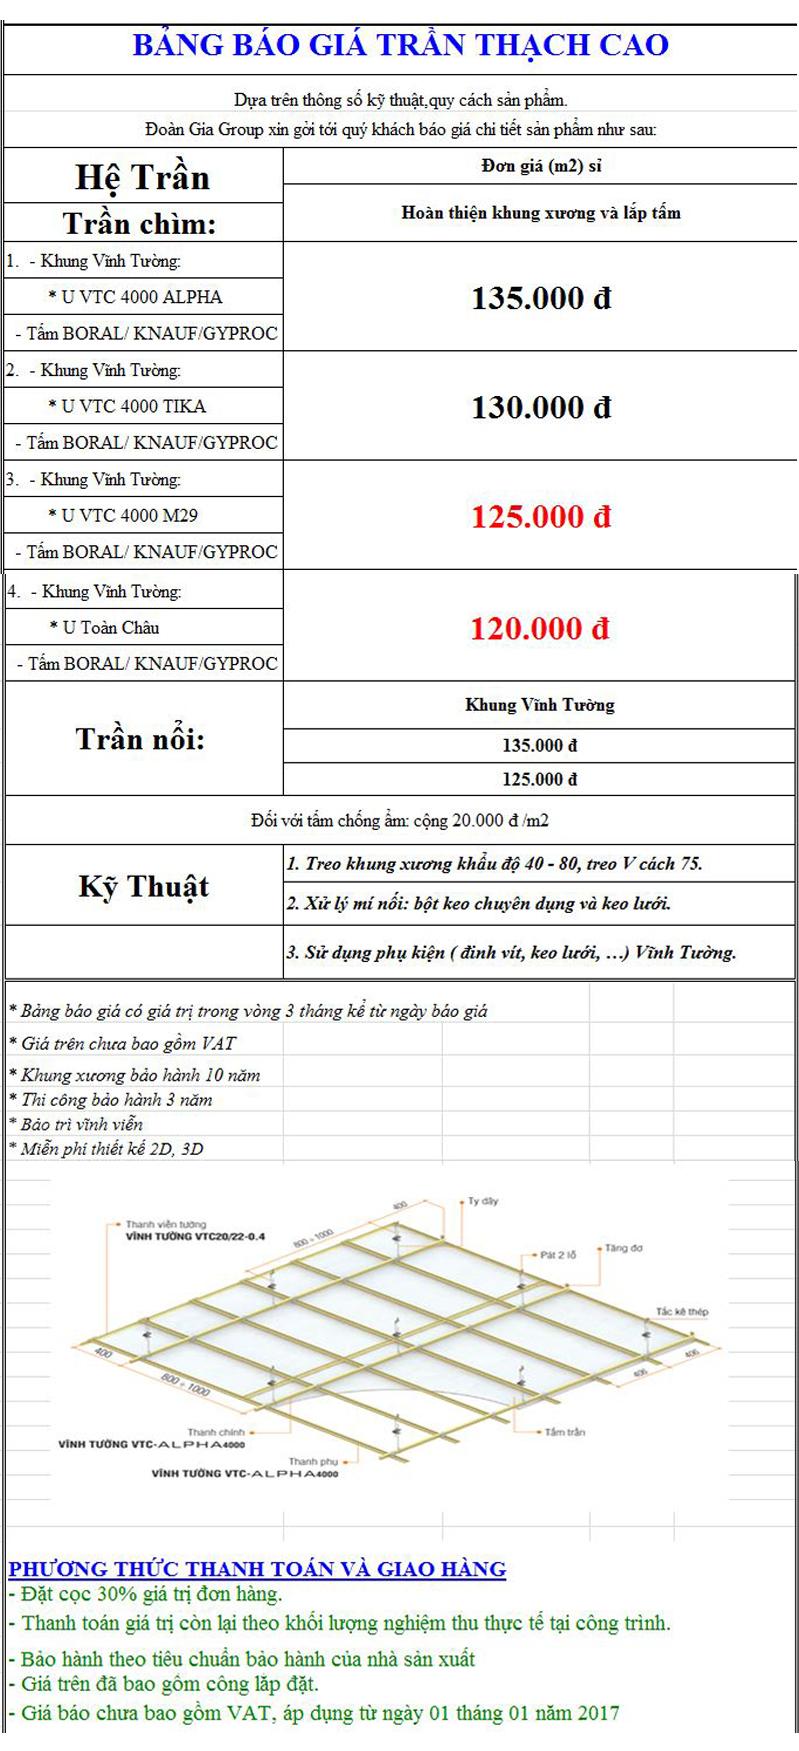 bao-gia-tran-thach-cao Bảng giá trần thạch cao